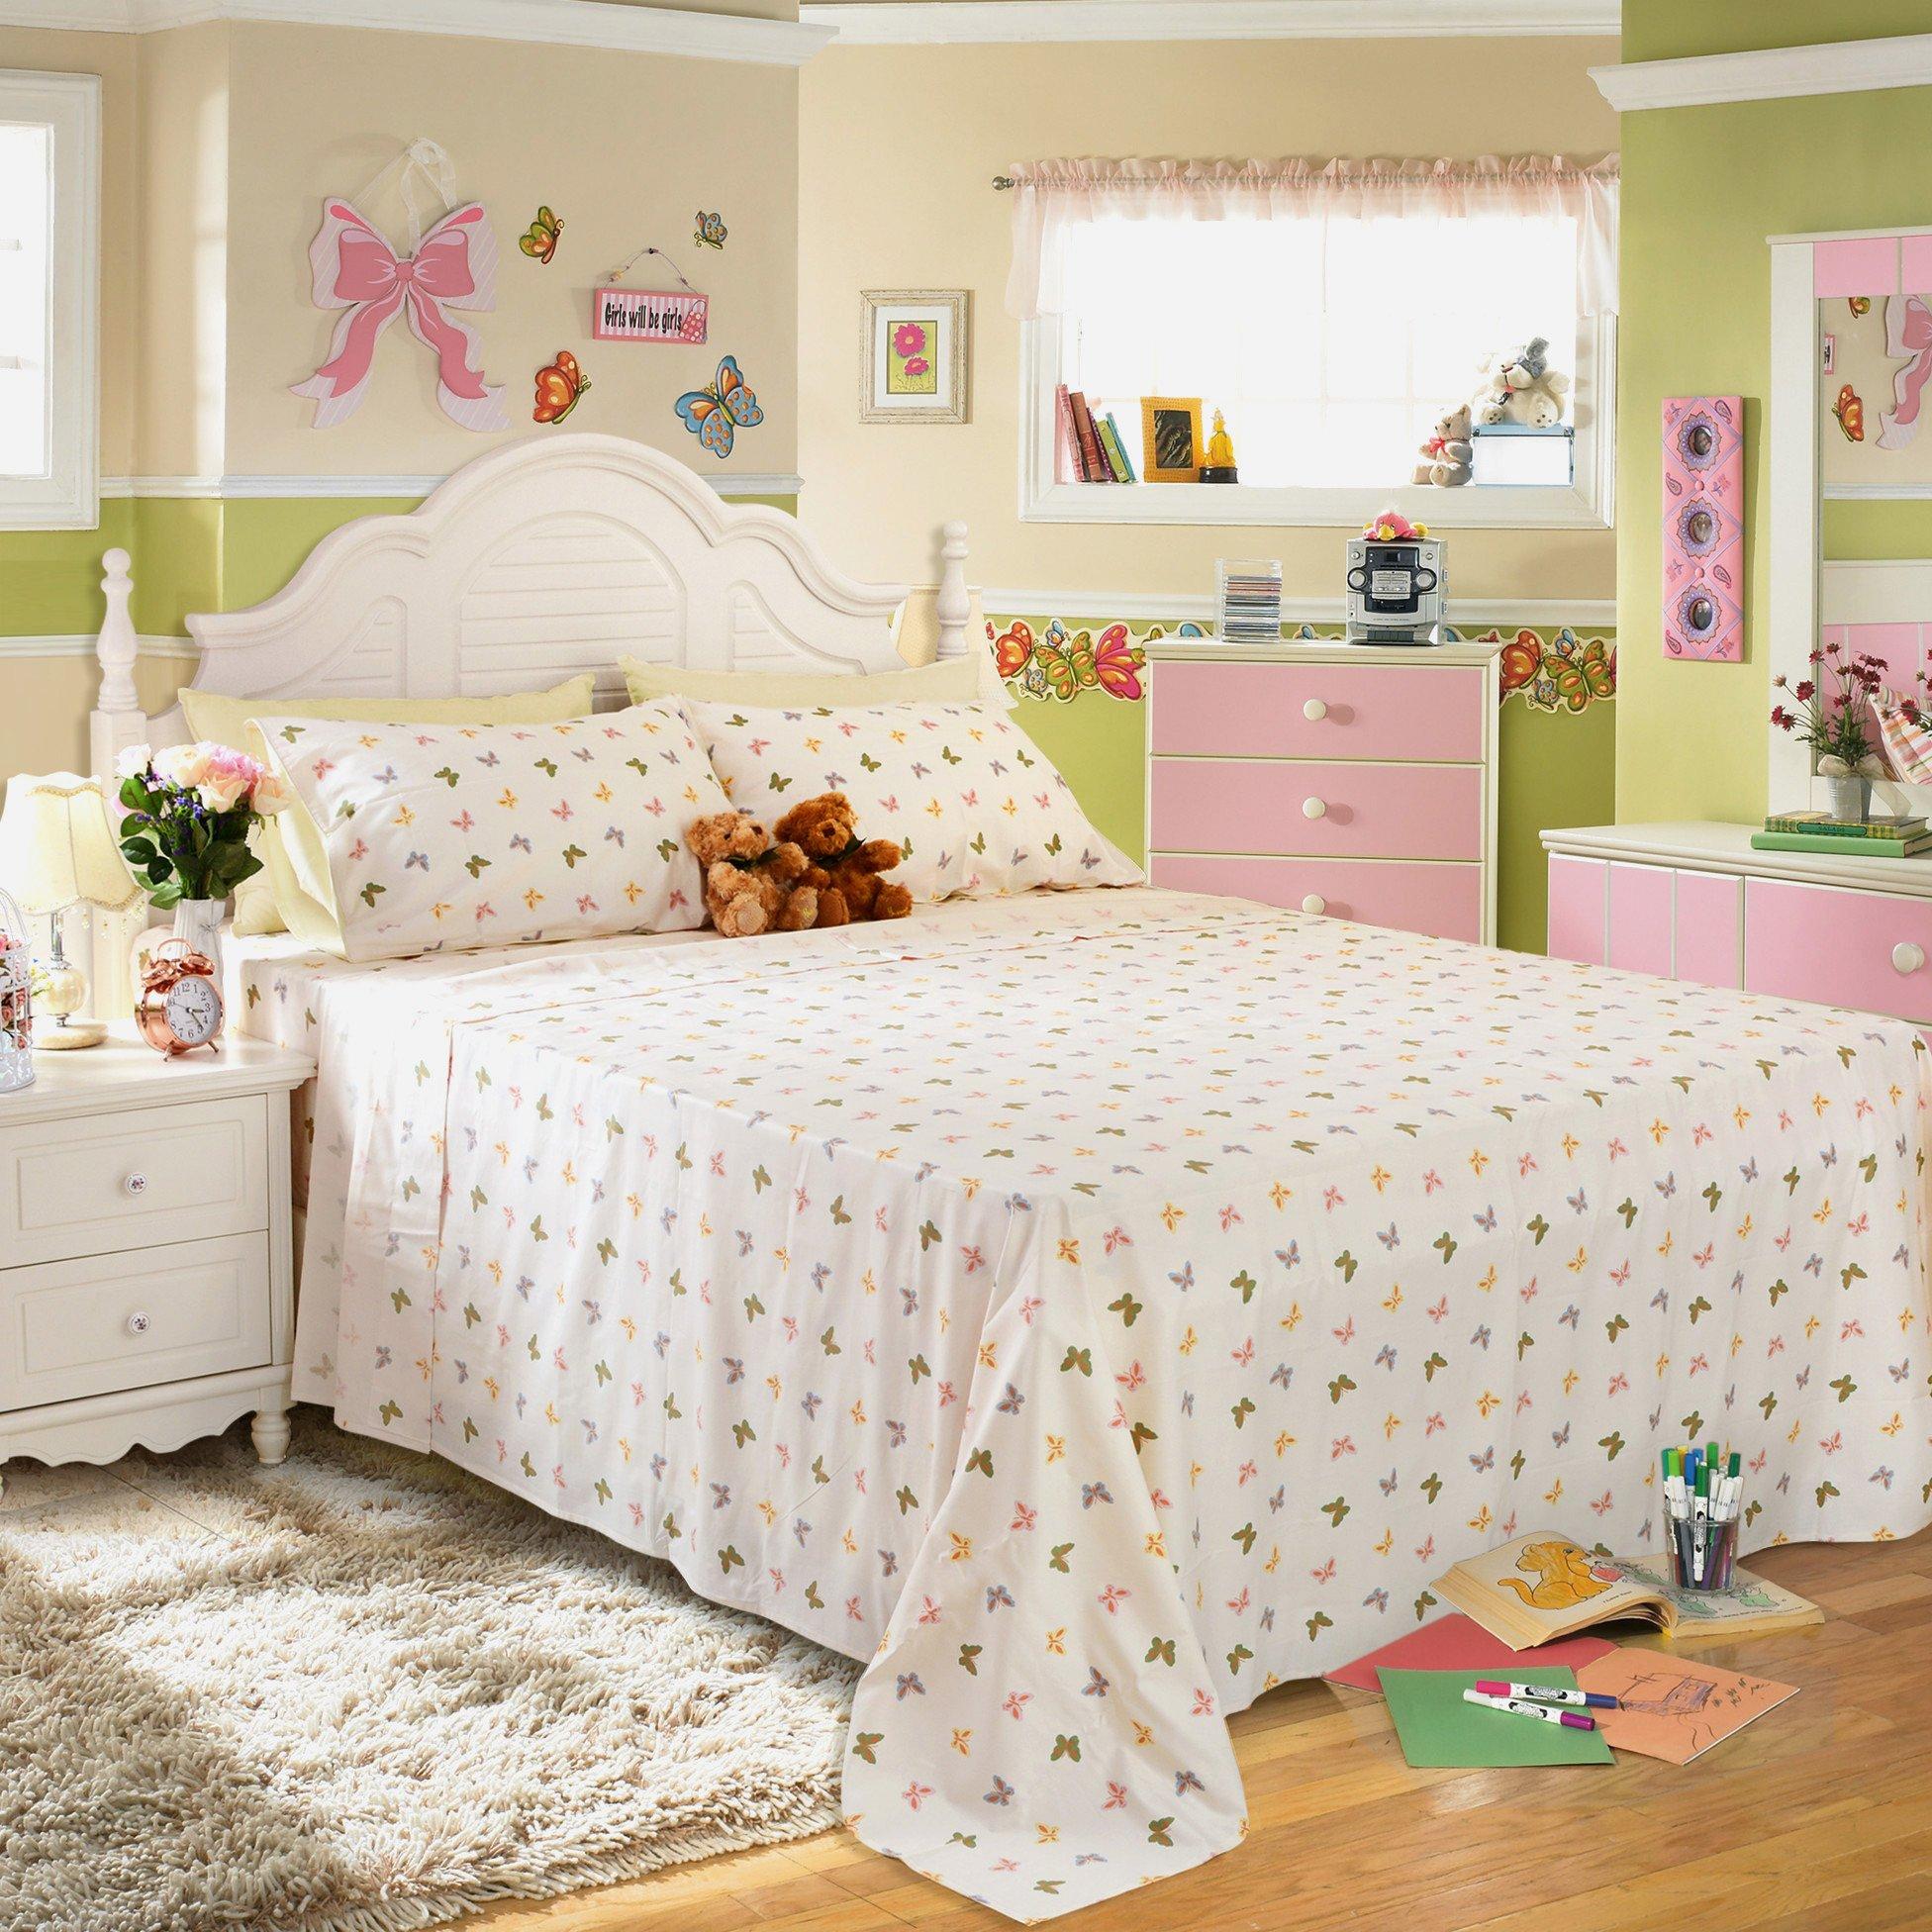 Brandream Shabby Butterfly Bedding Girls Bed Sheet Set Romantic Sheets Set Deep Pocket 18 Inch 100% Cotton Bedding Sets King Size-Fitted Sheet Flat Sheet Shams 4Pcs 800TC